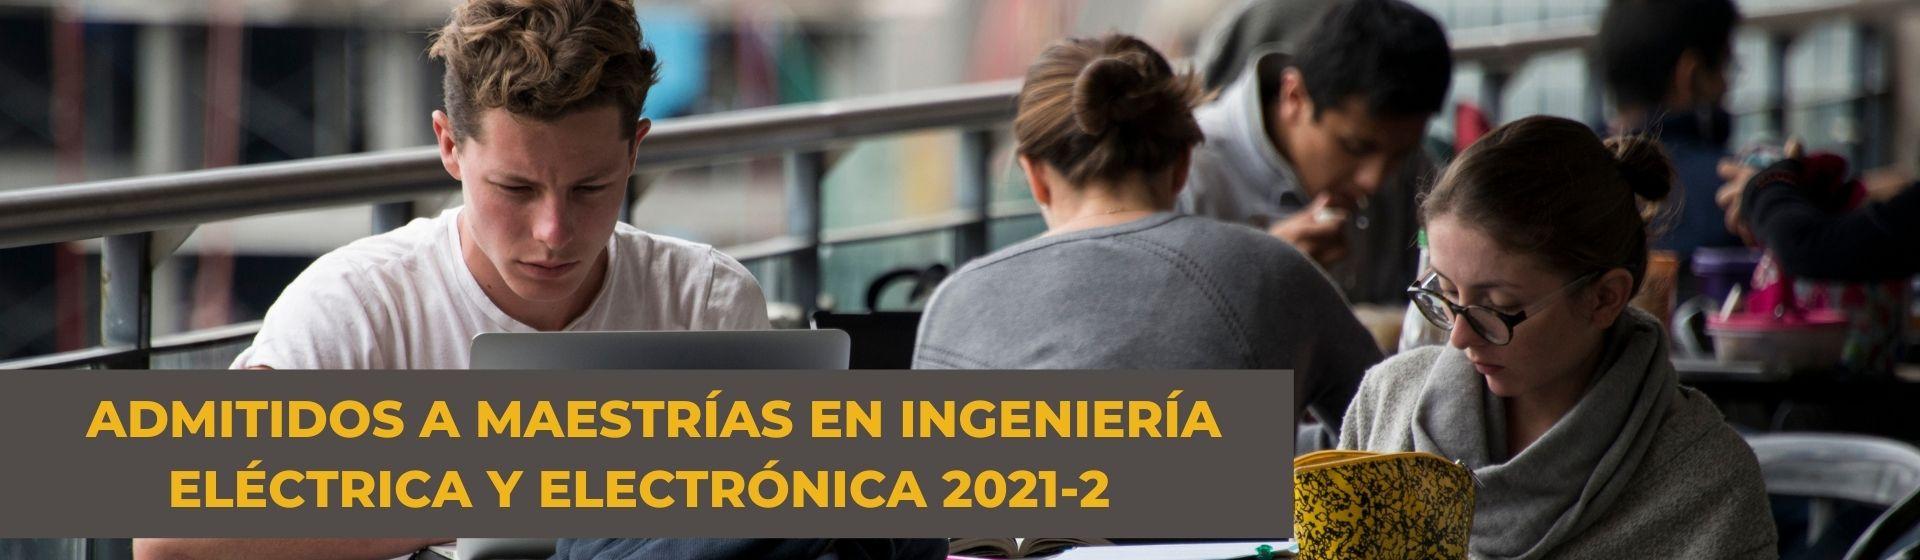 admitidos maestría 2021-2